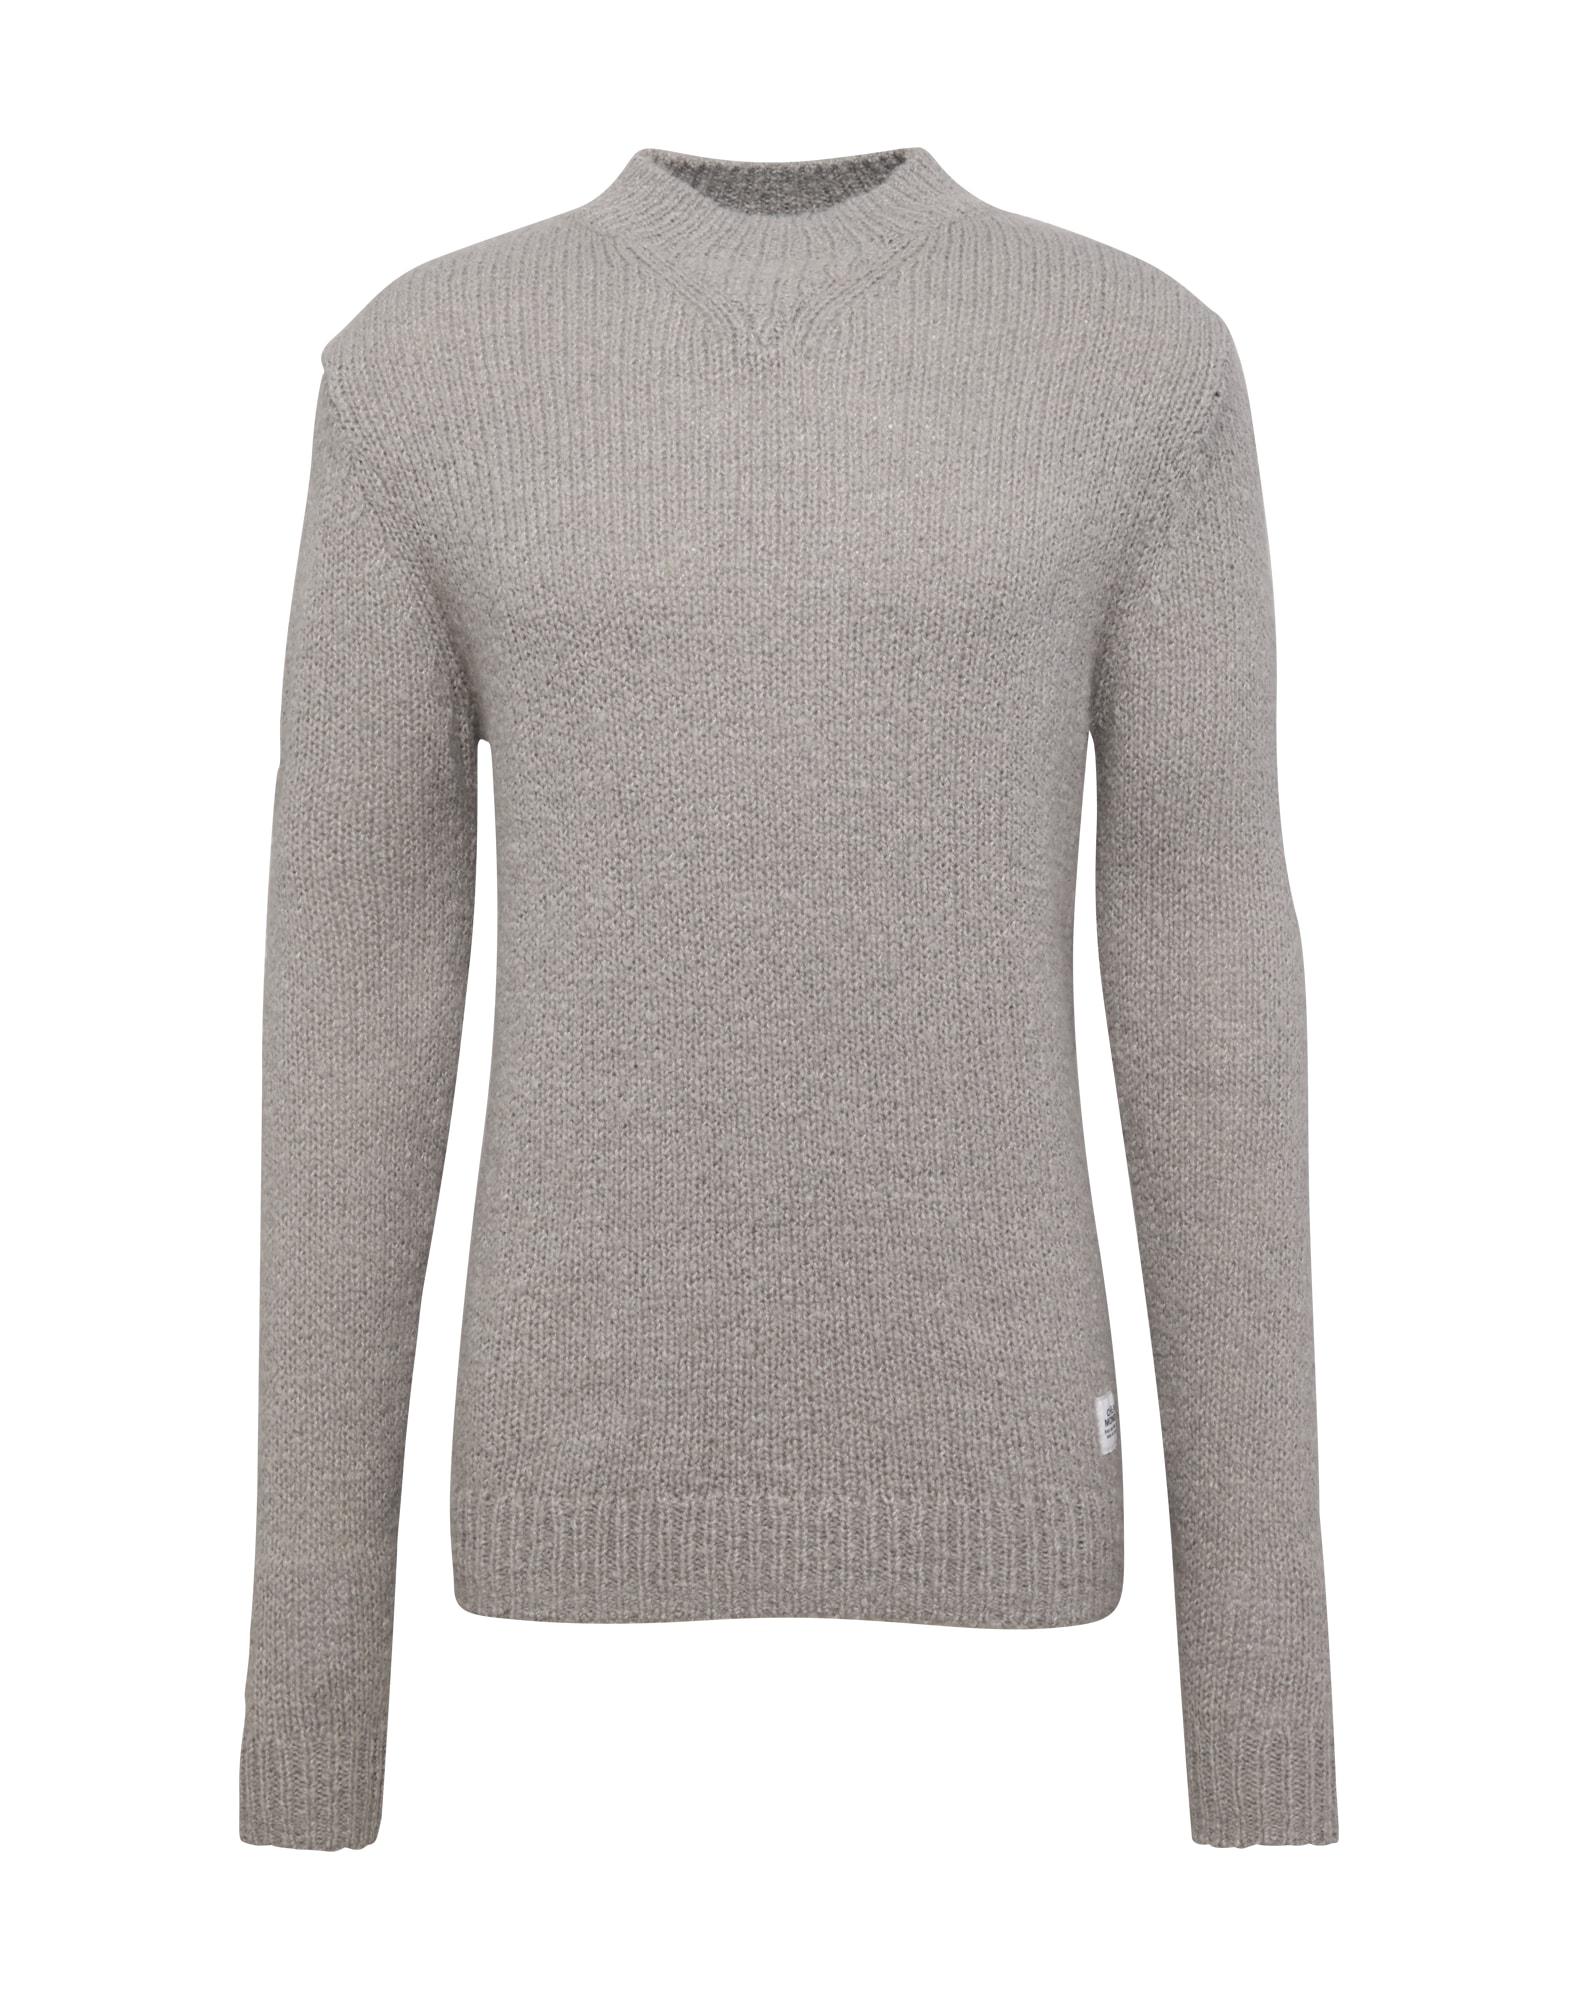 CHEAP MONDAY Heren Trui Challenge knit grijs